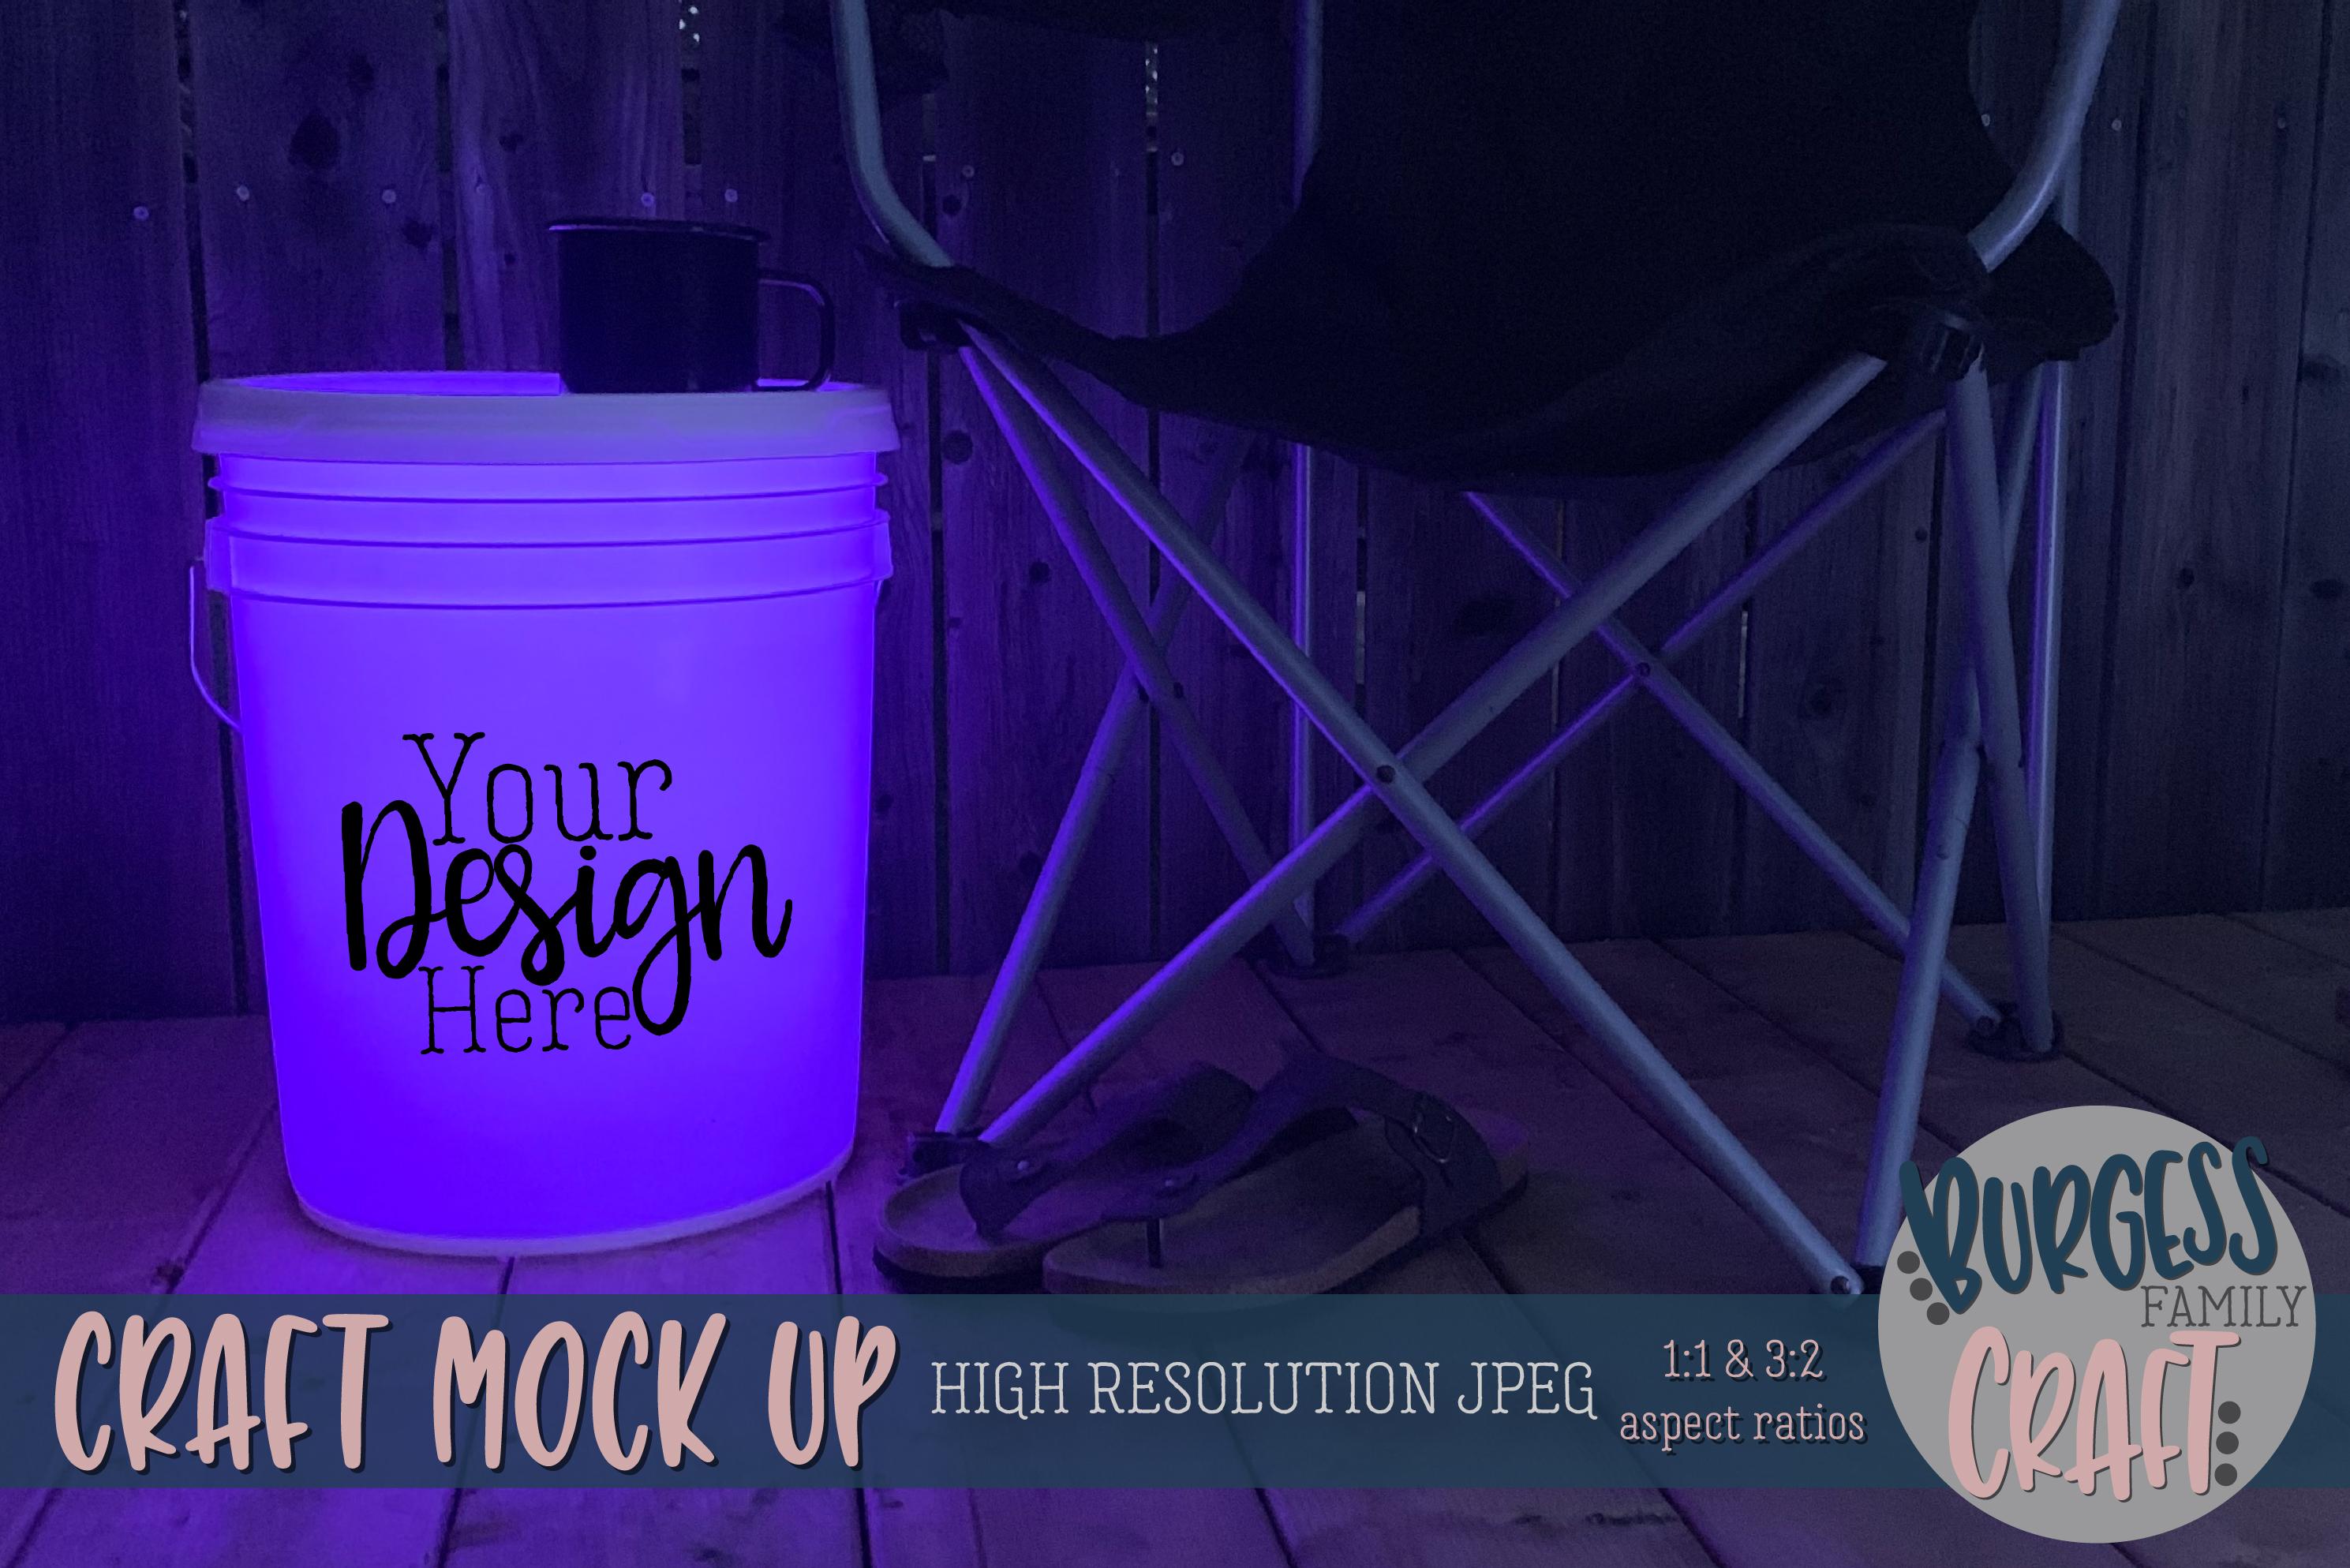 Bucket light table purple Craft mock up|High Resolution JPEG example image 1